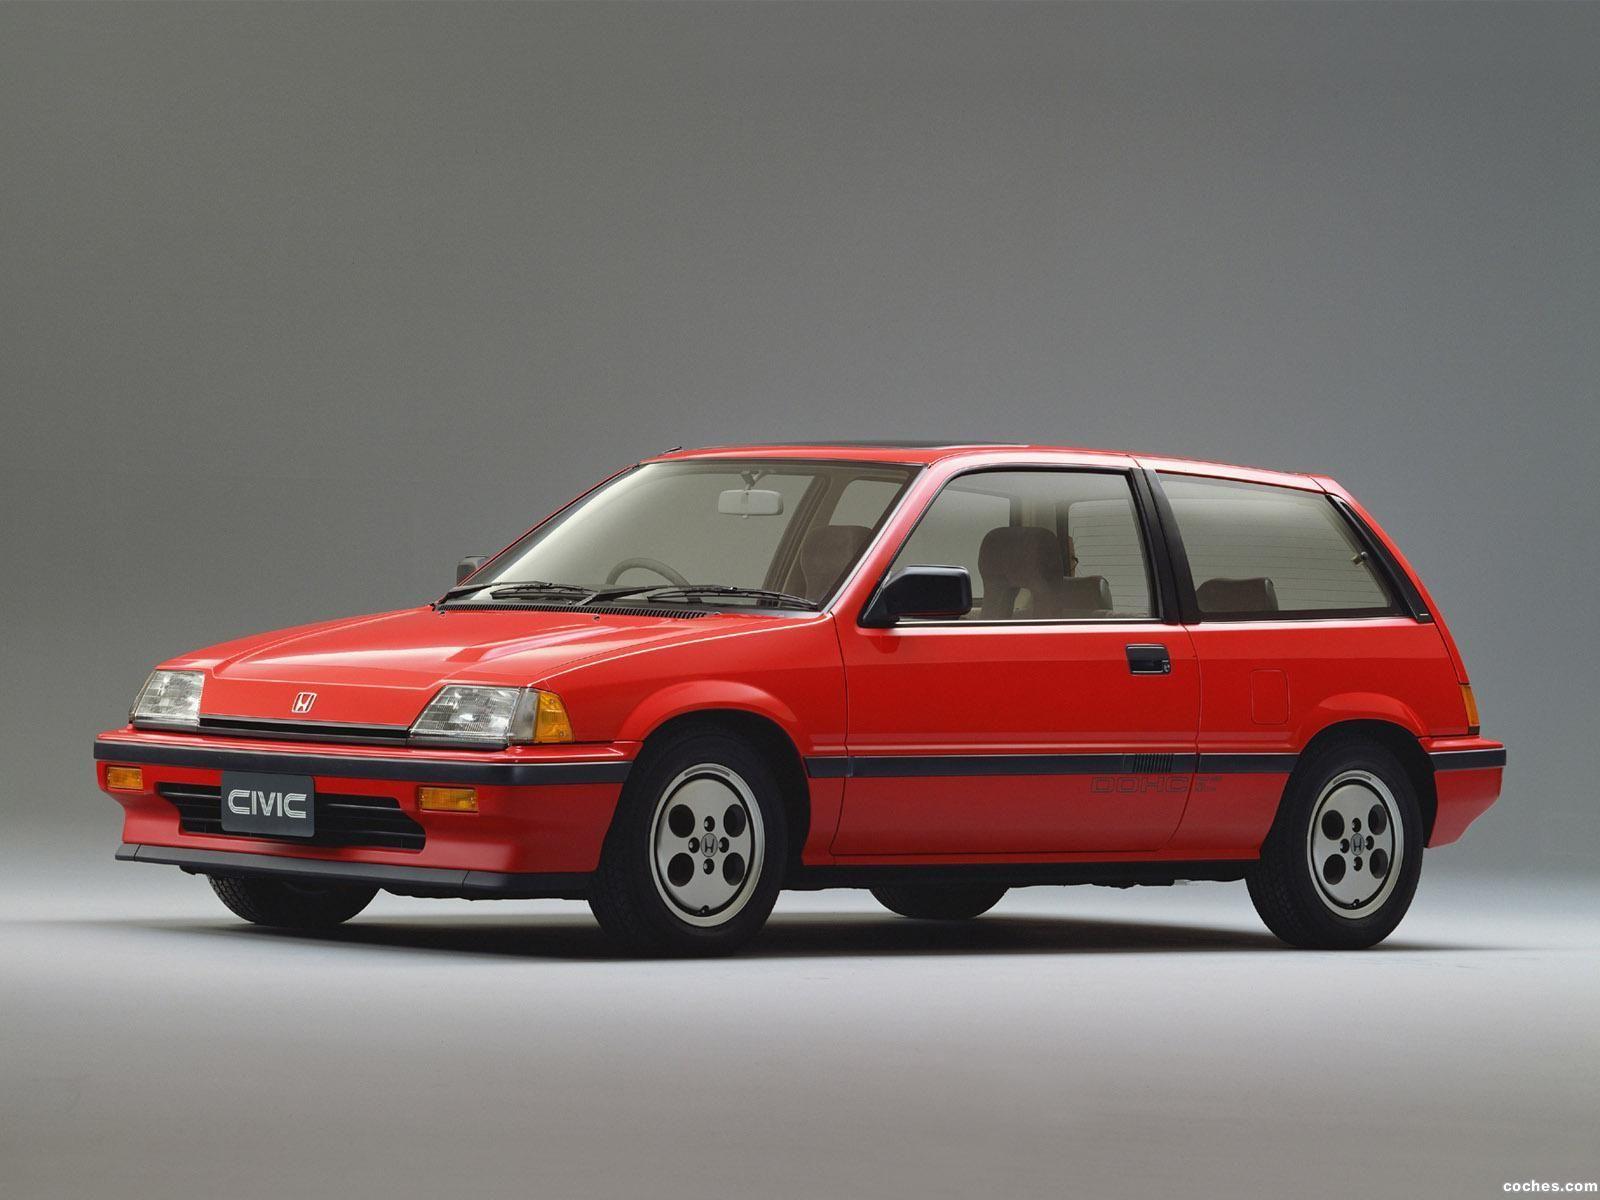 Honda Civic Si (Third Generation) Honda civic si